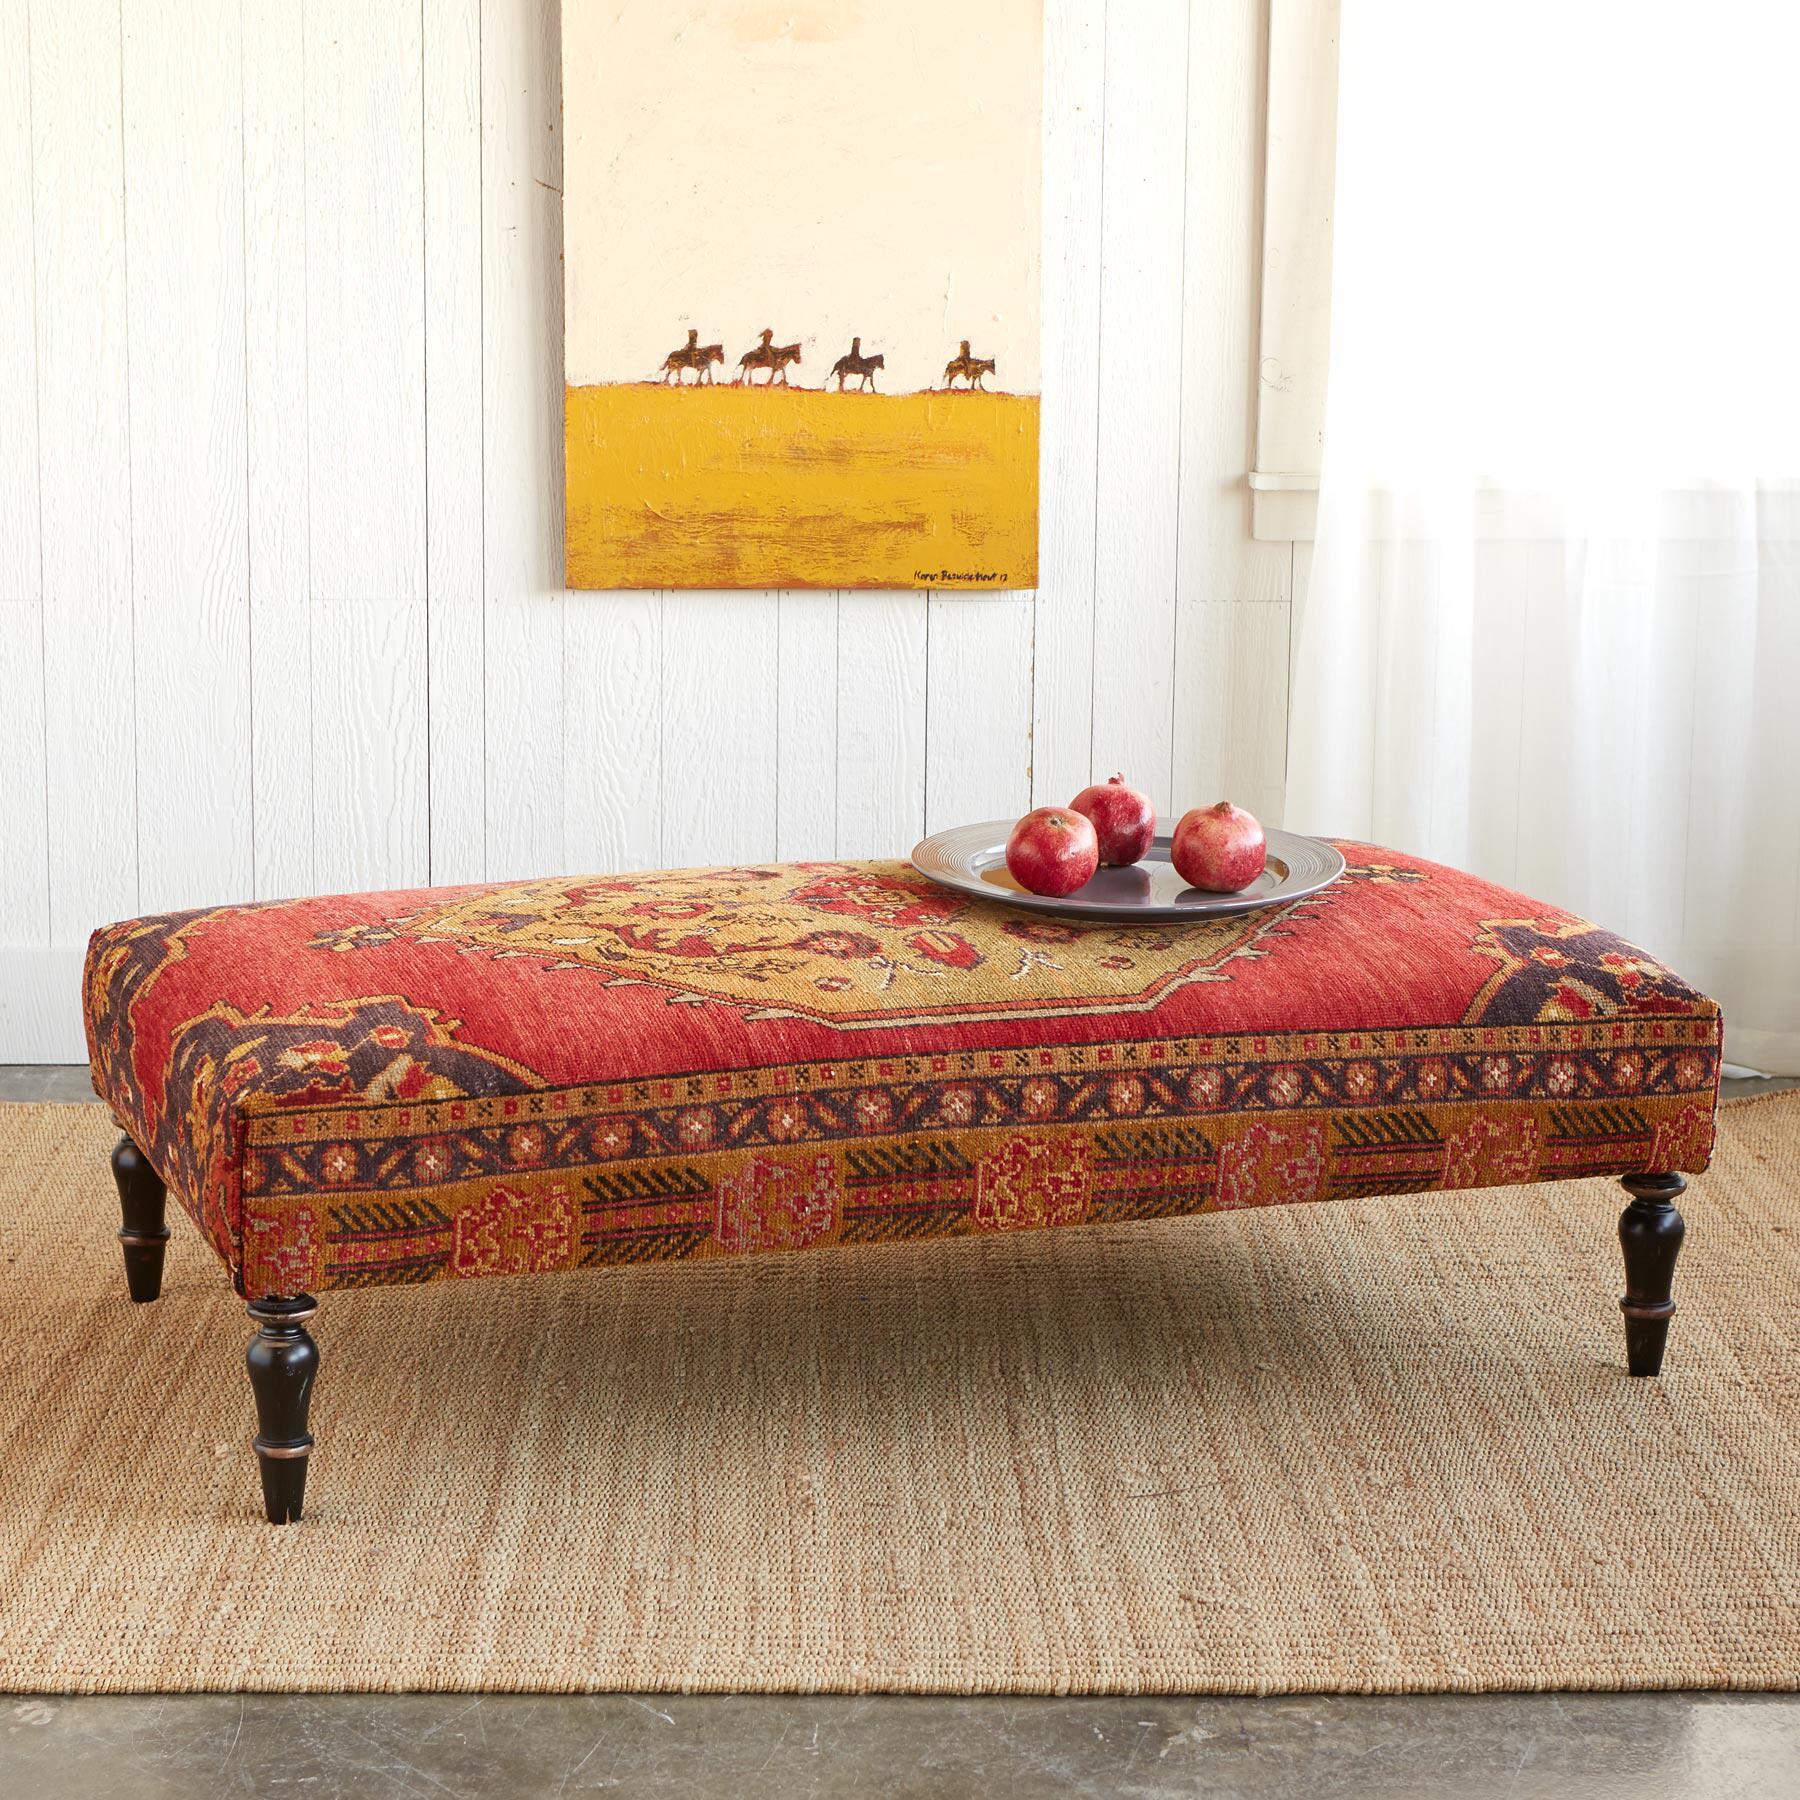 IZMIR TURKISH CARPET OTTOMAN: View 1